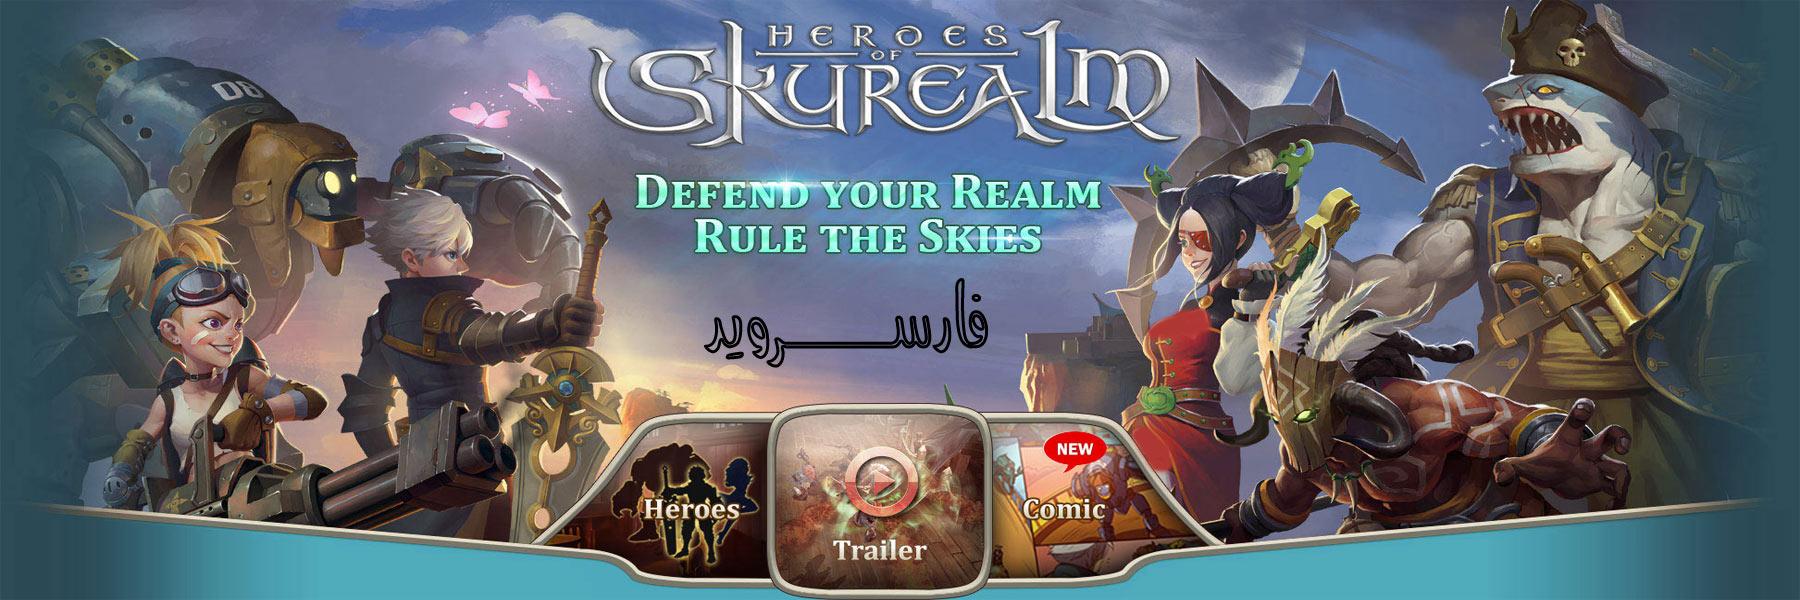 Heroes of Skyrealm